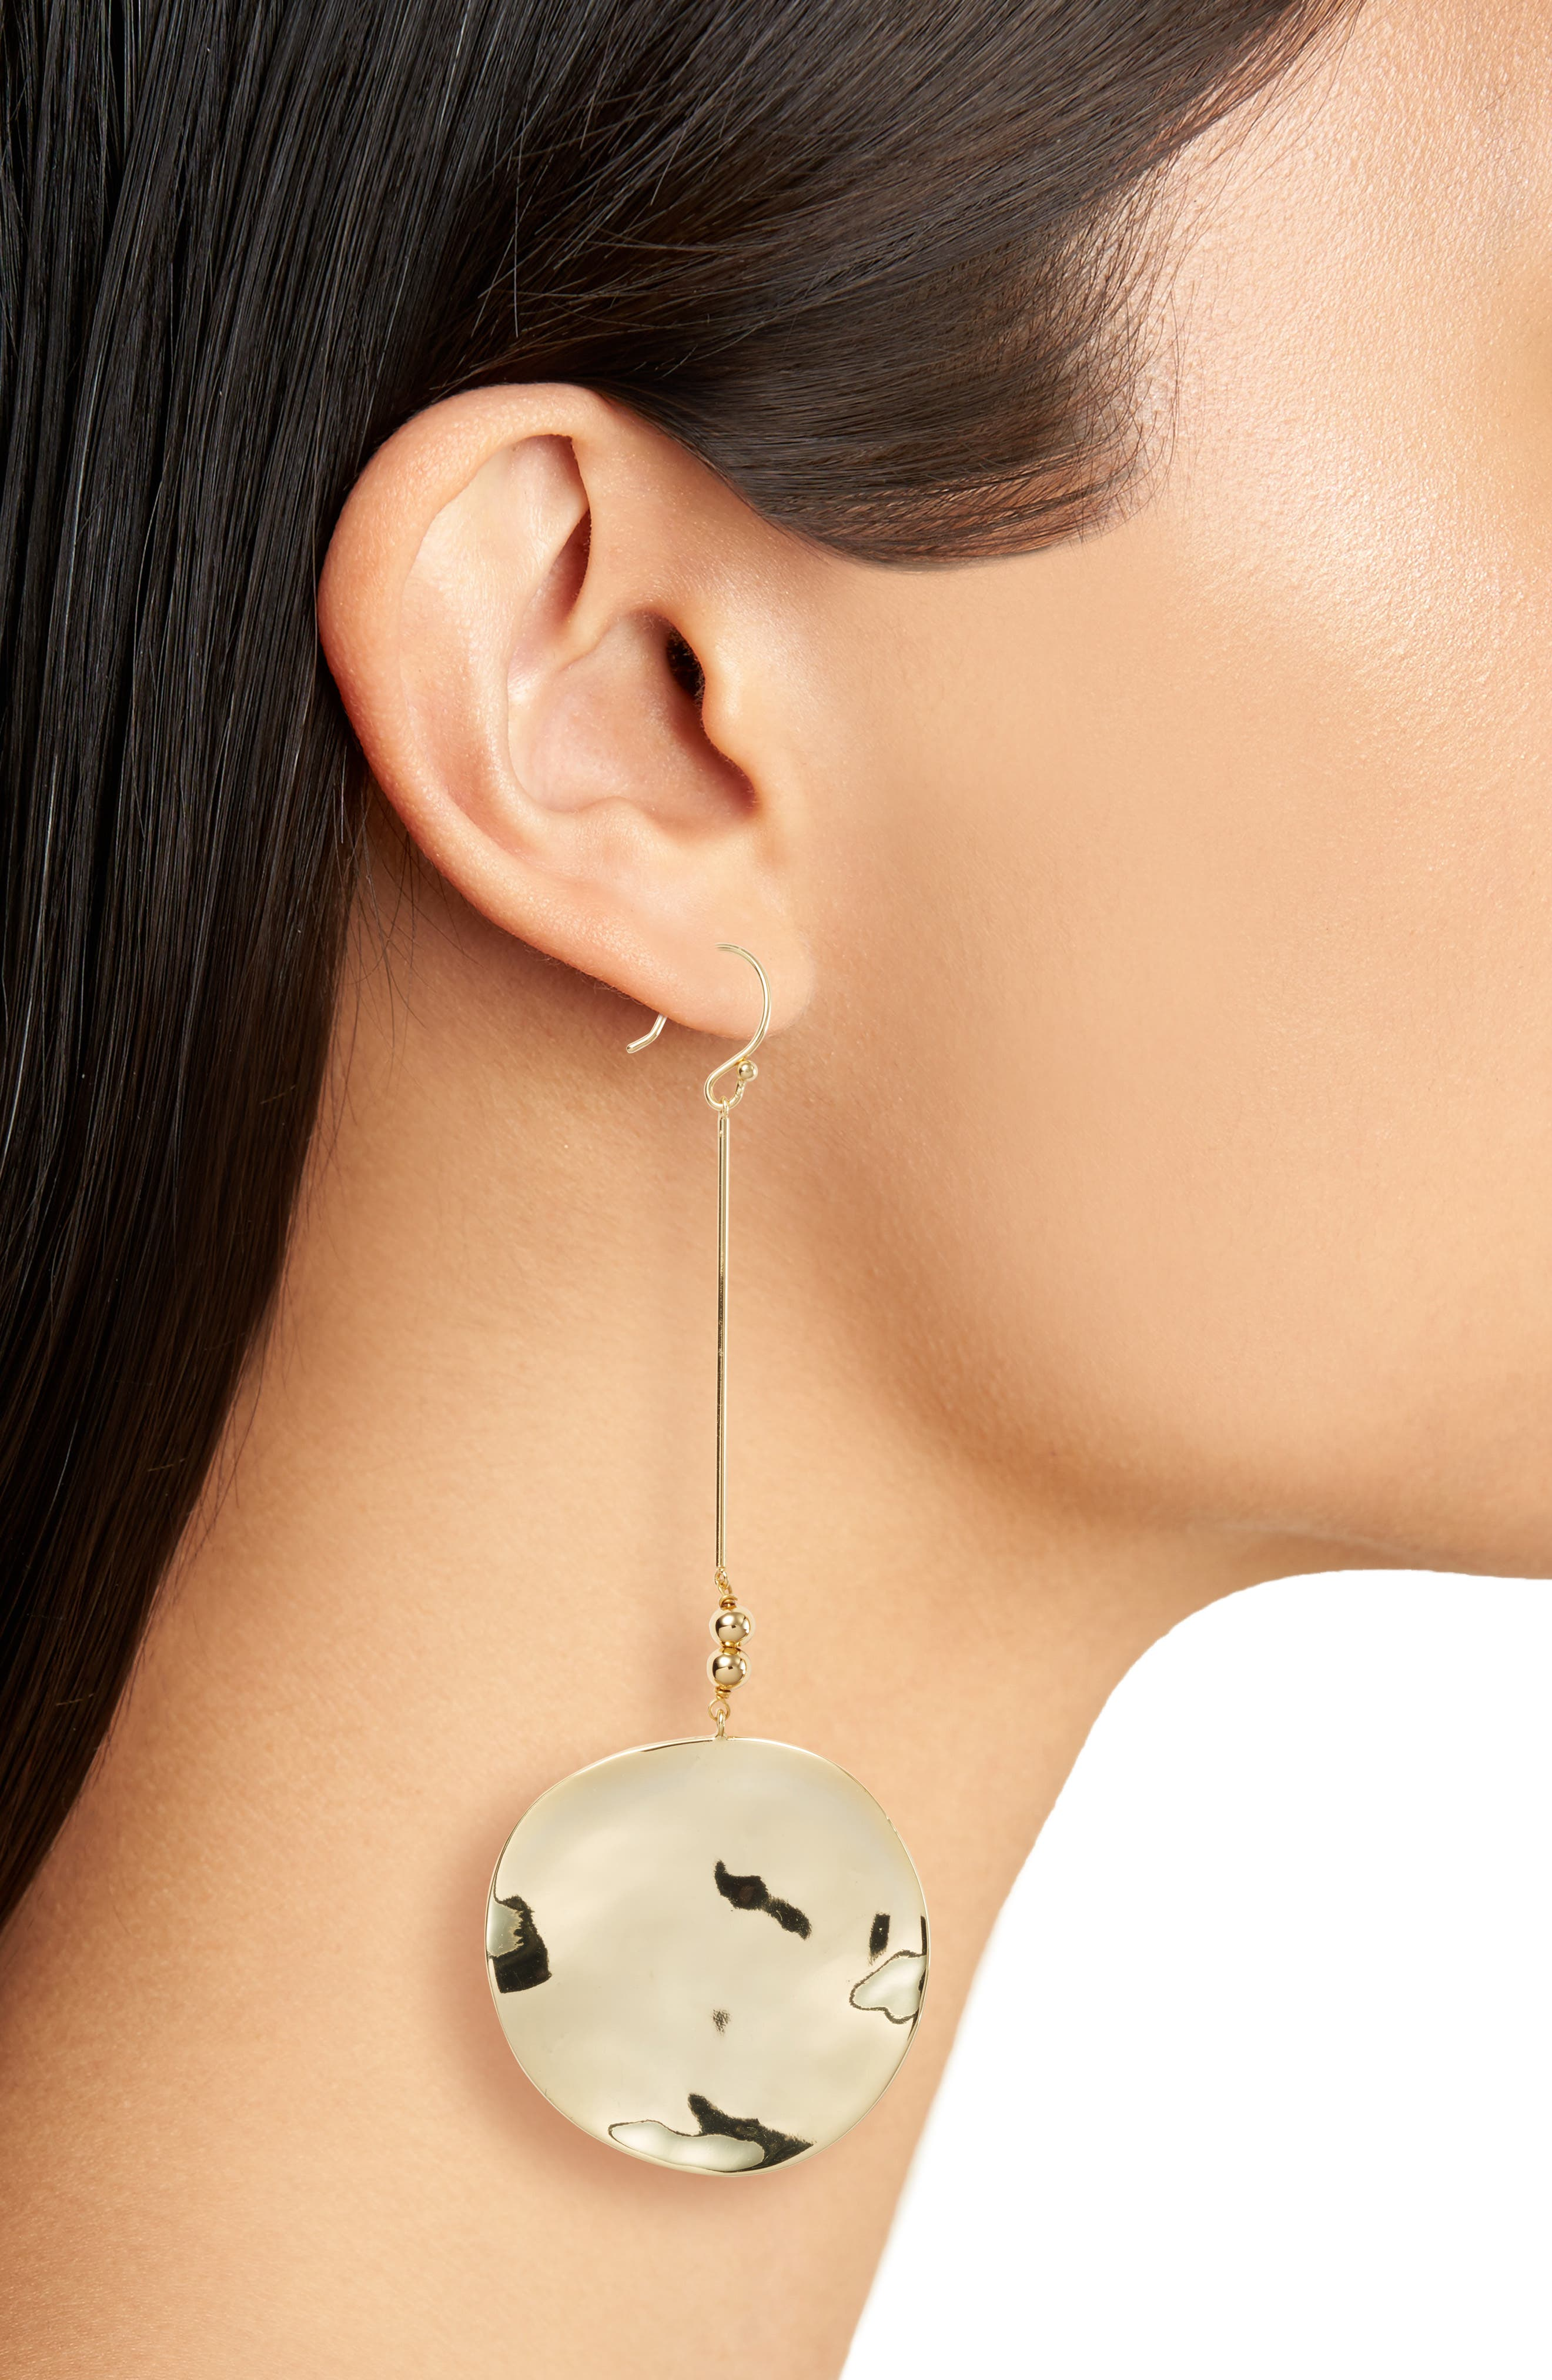 Chloe Drop Earrings,                             Alternate thumbnail 2, color,                             710